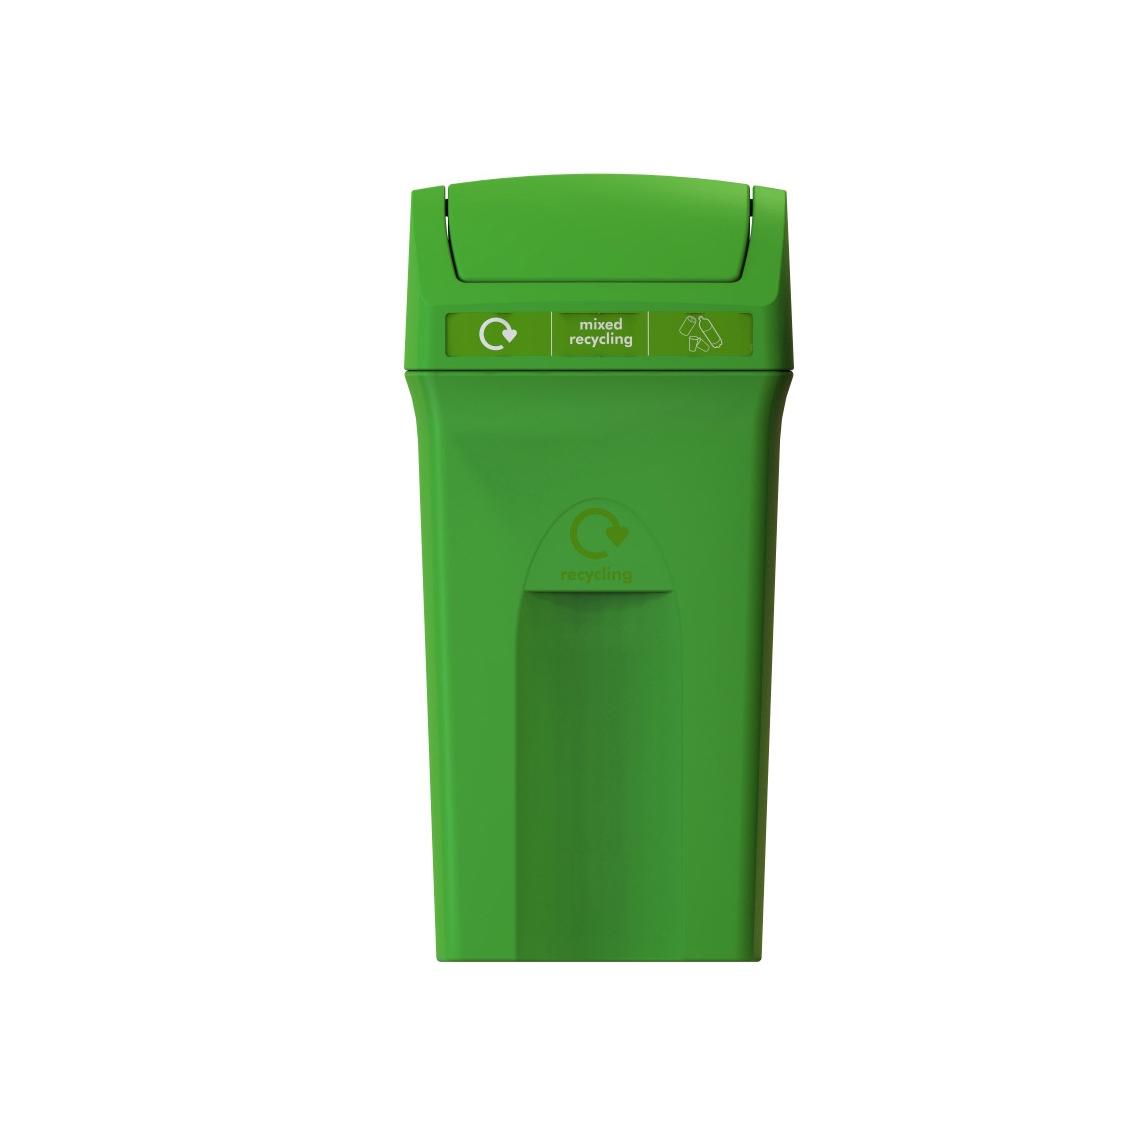 81155-Enviro-100-Flip-top-green